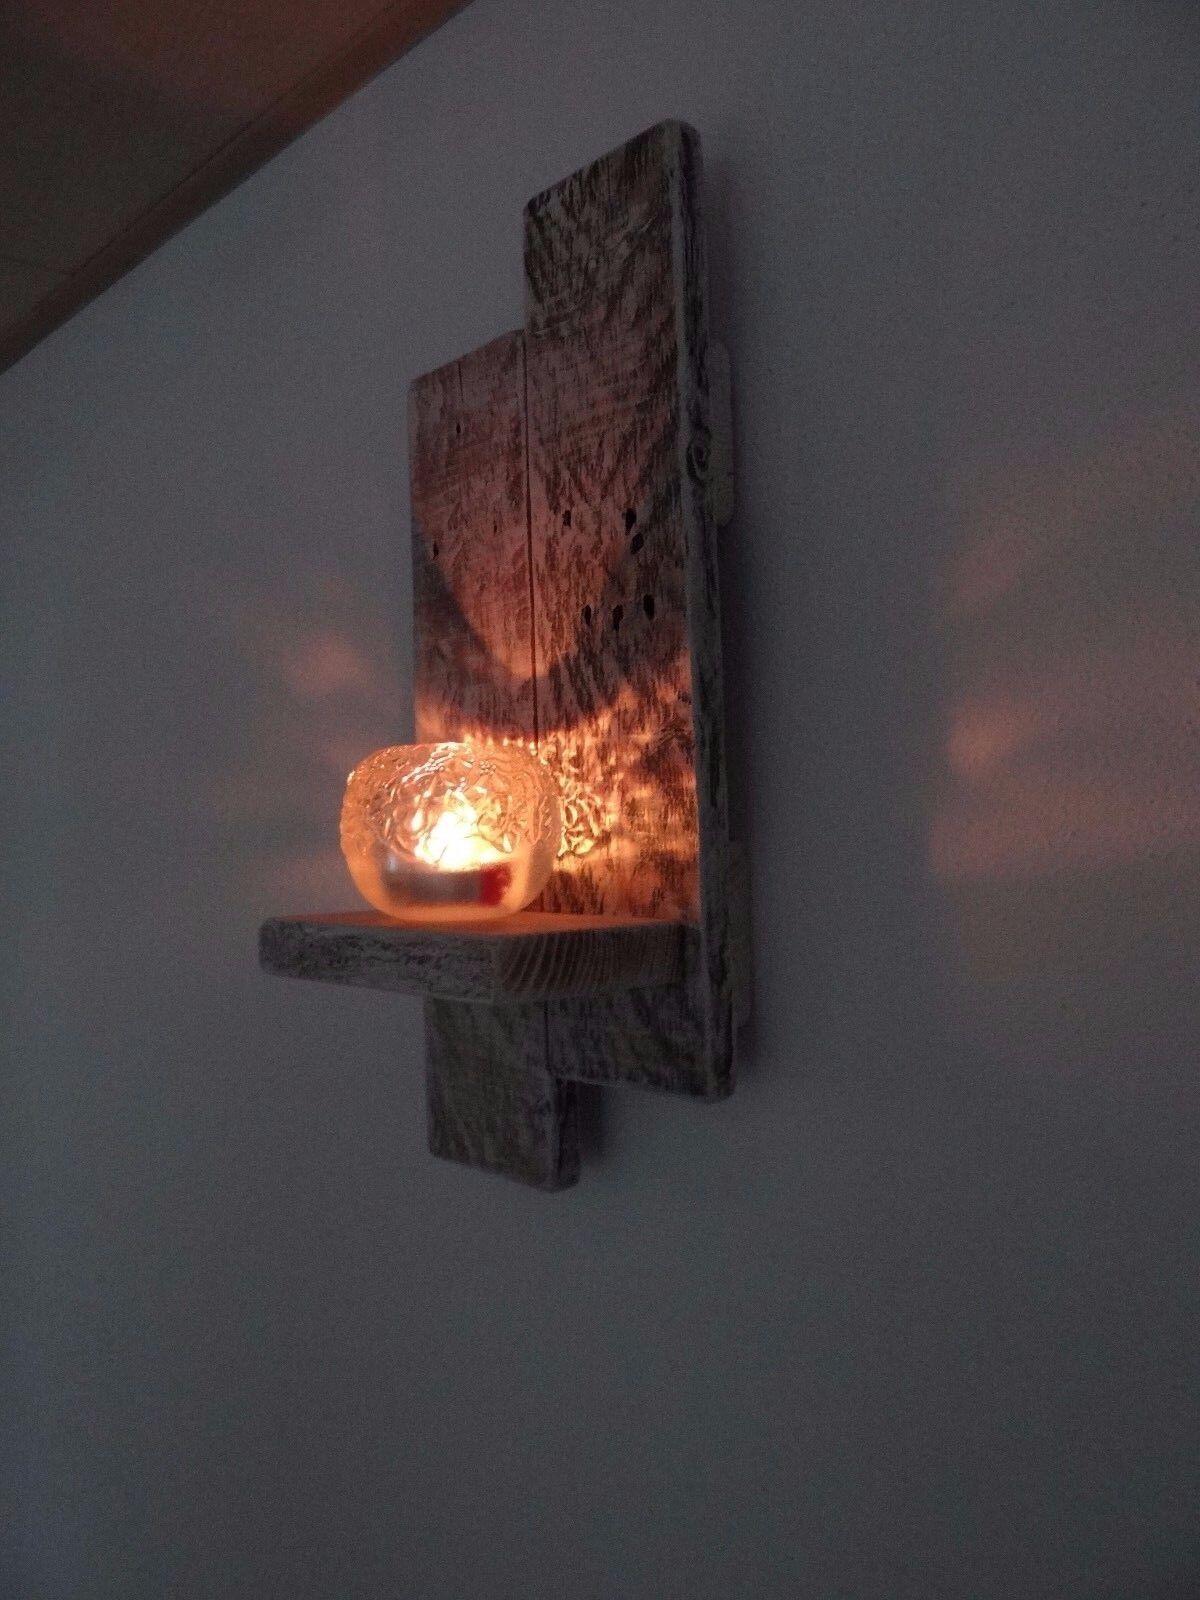 wandkerzenhalter kerzenhalter teelichthalter holz shabby landhaus rustikal eur 17 99 picclick de. Black Bedroom Furniture Sets. Home Design Ideas